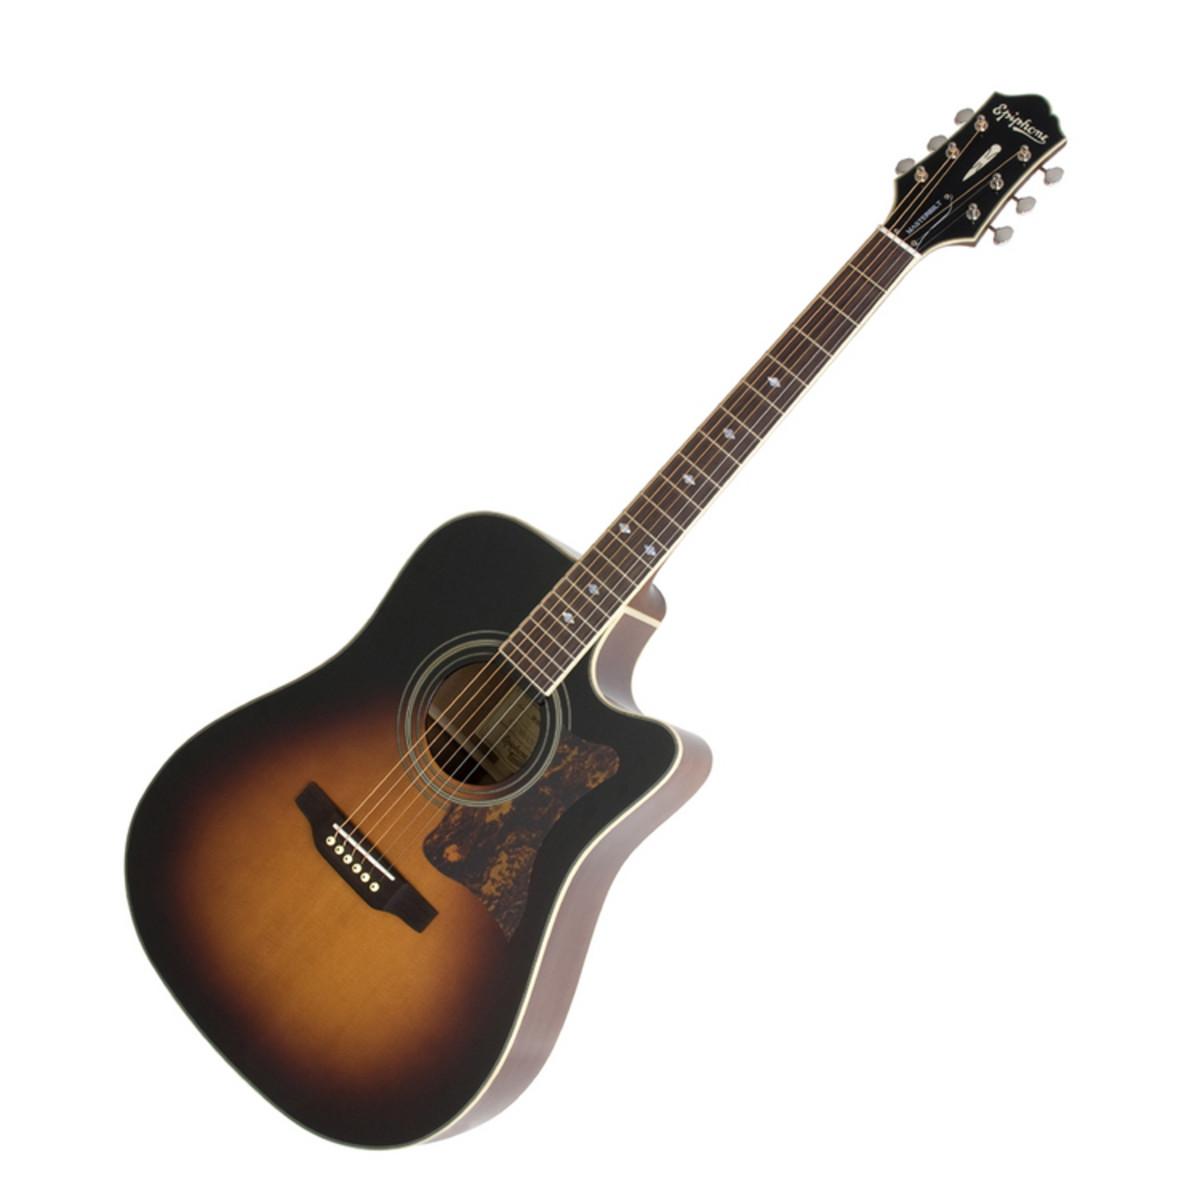 epiphone masterbilt dr 500mce guitare electro acoustique. Black Bedroom Furniture Sets. Home Design Ideas